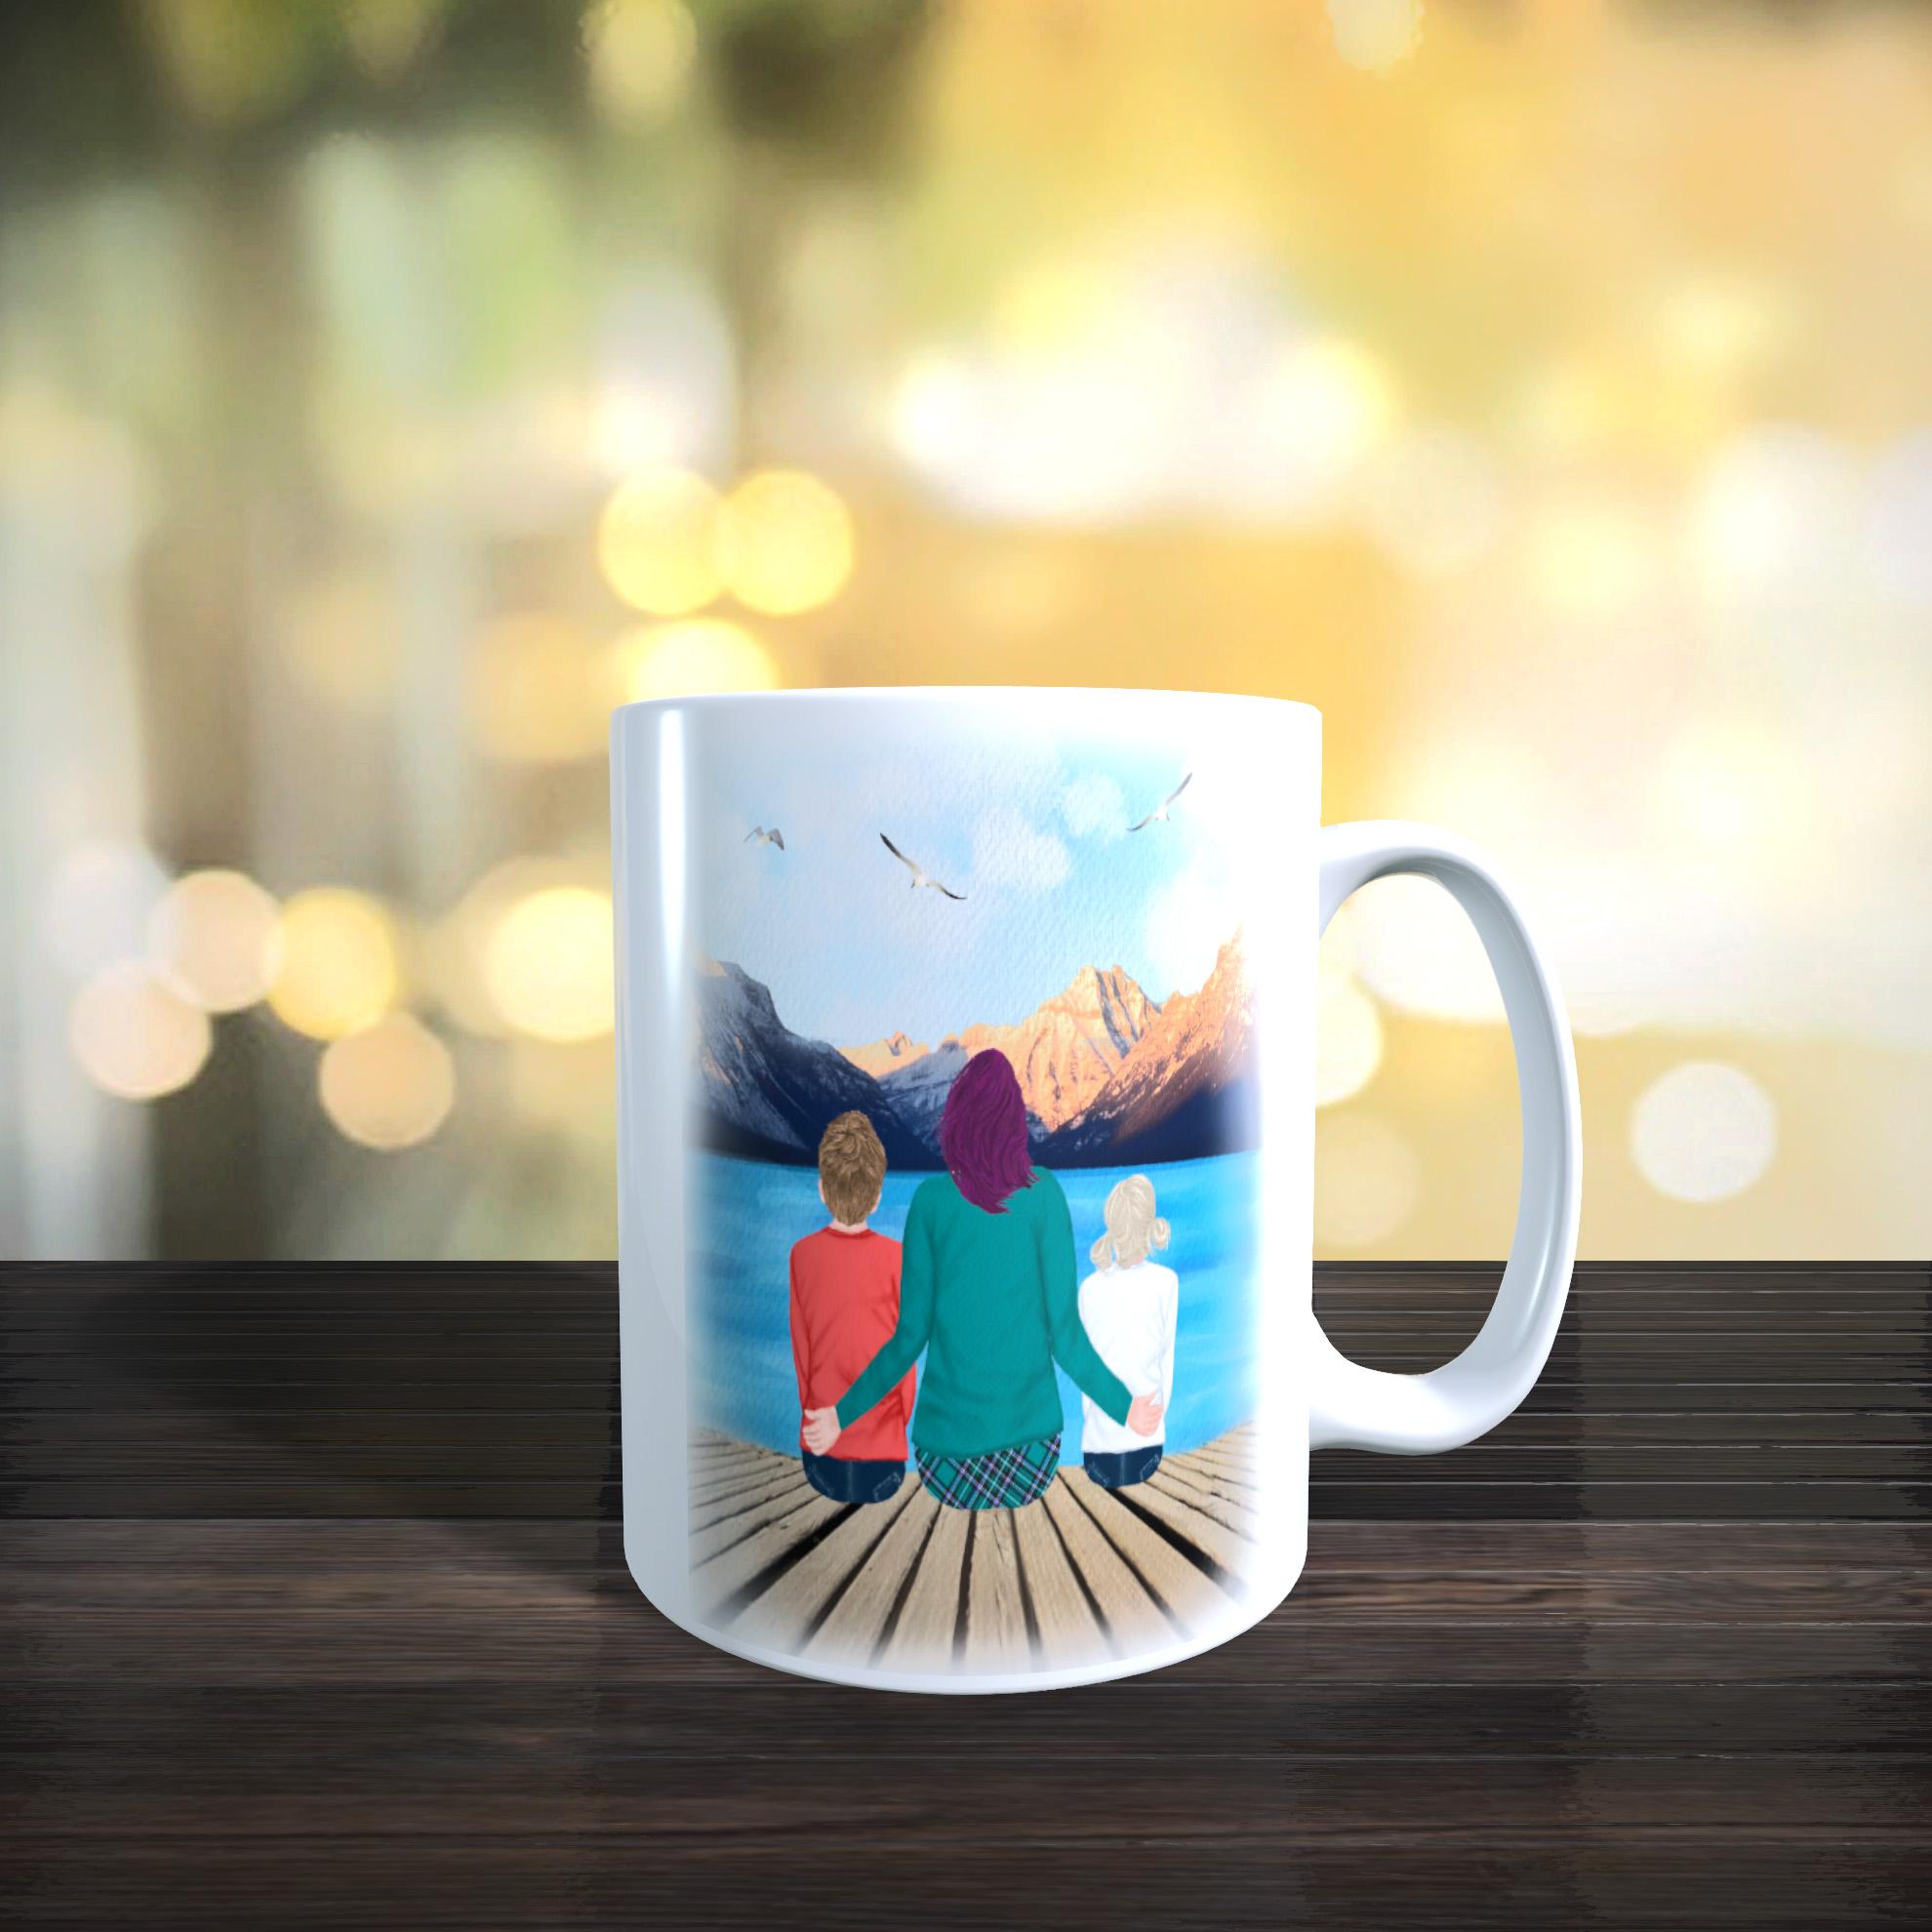 11oz Ceramic Mothers Day / Birthday Mug. Mother With Children